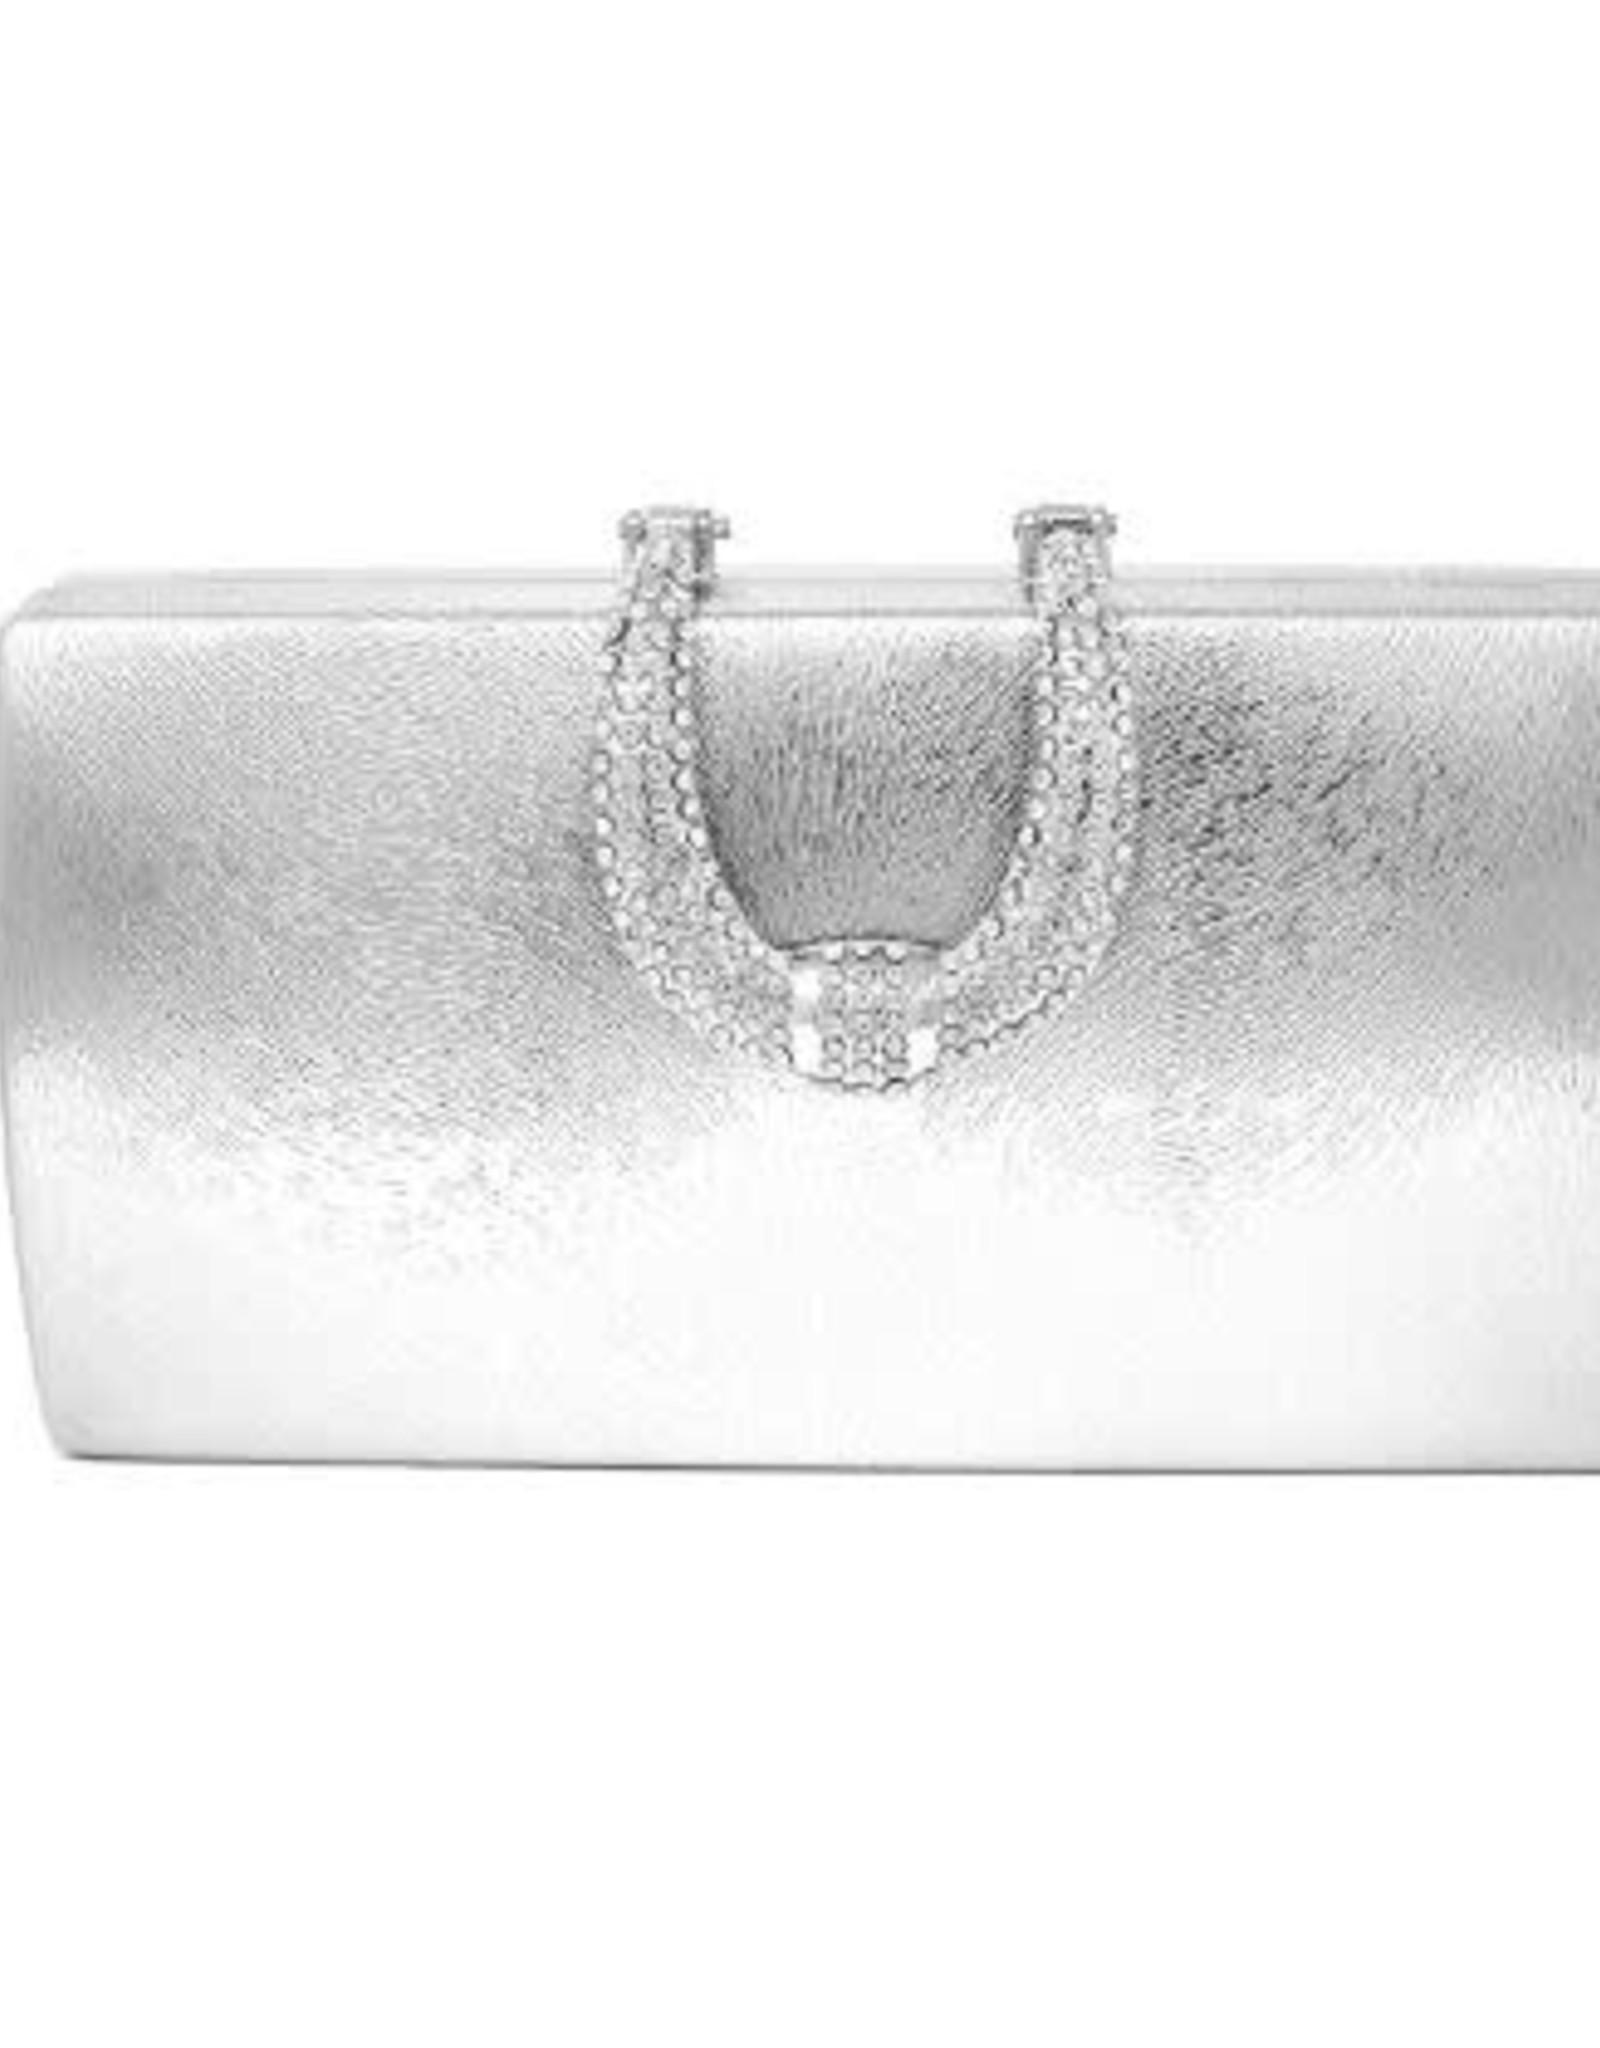 USJ Rhinestone Pave Buckle Detail Metallic Faux Leather Hard Case Clutch - Silver